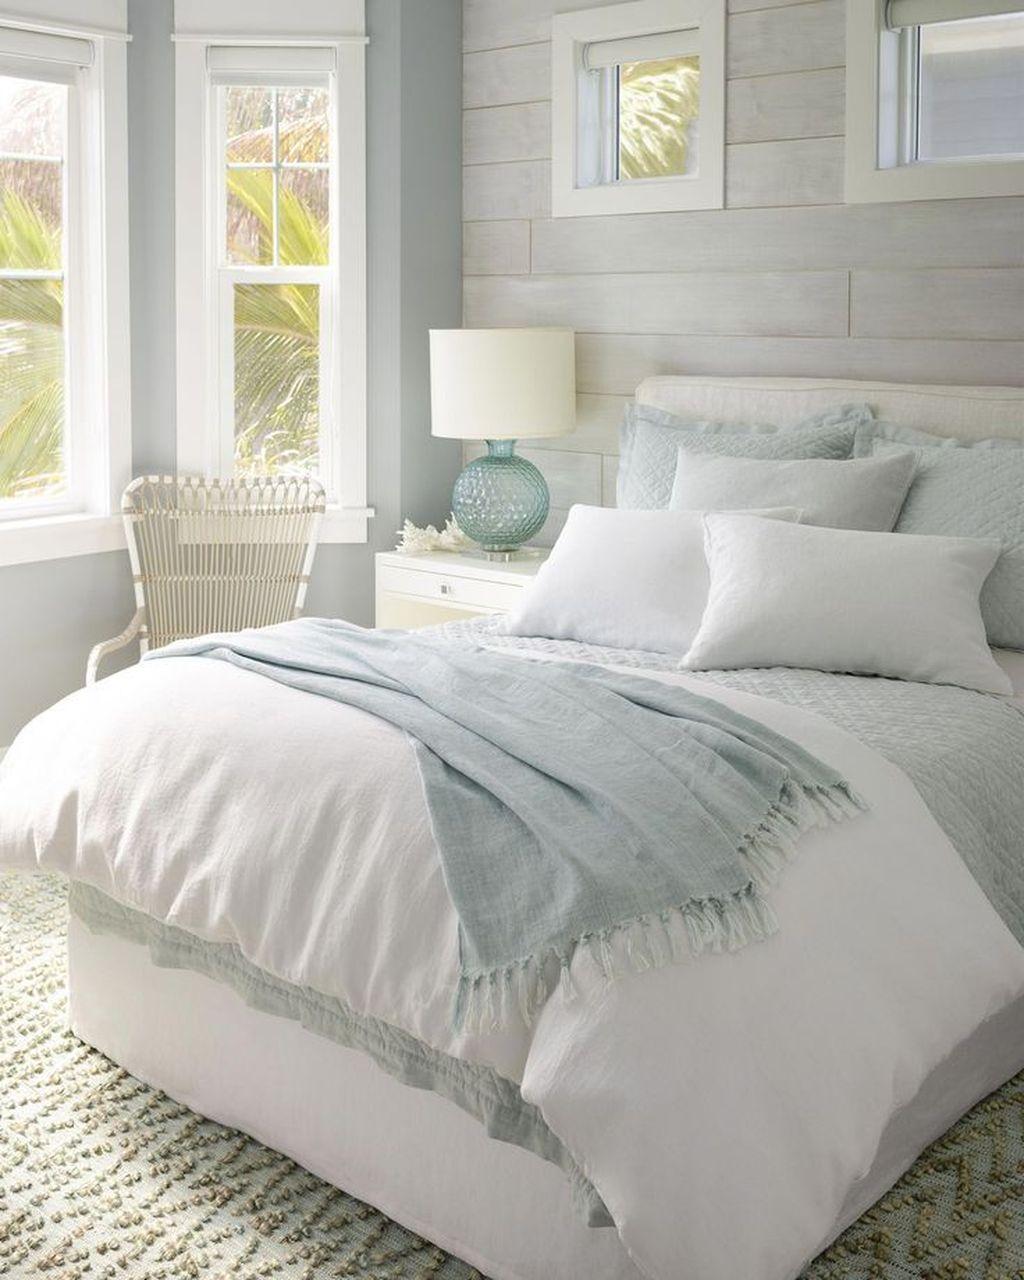 Lovely Spring Bedroom Decor Ideas Trending This Year 26